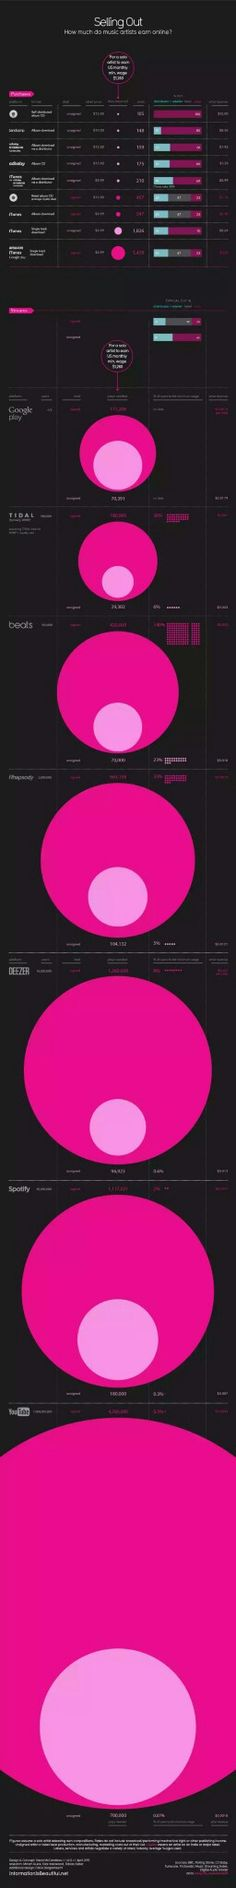 How much do music artist earn online?